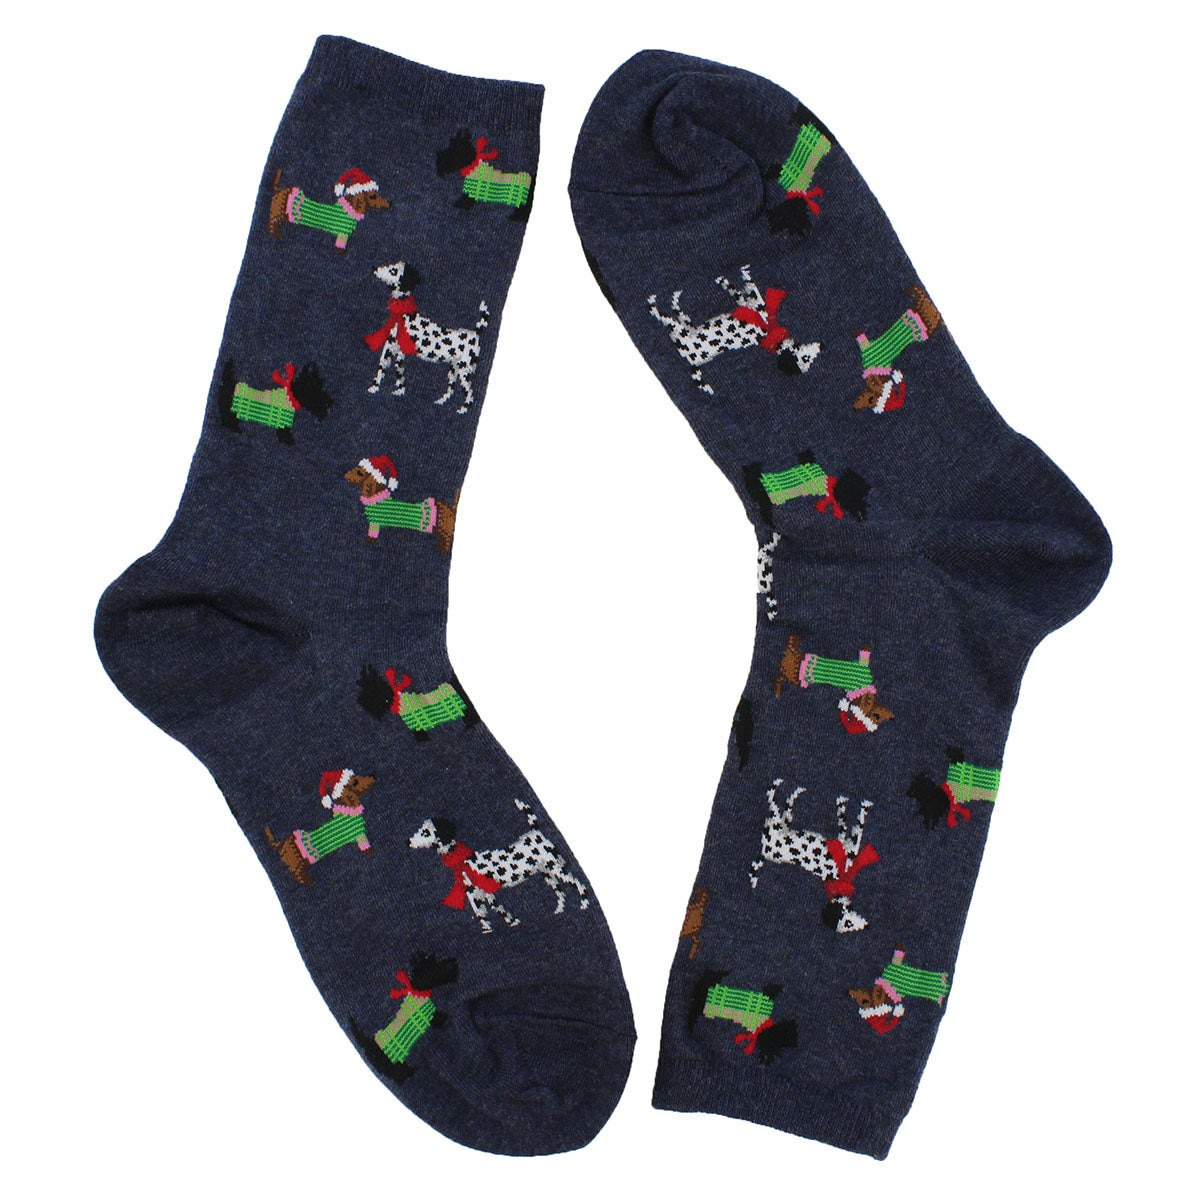 Chaussette motif ChristmasDogs dnm, fem